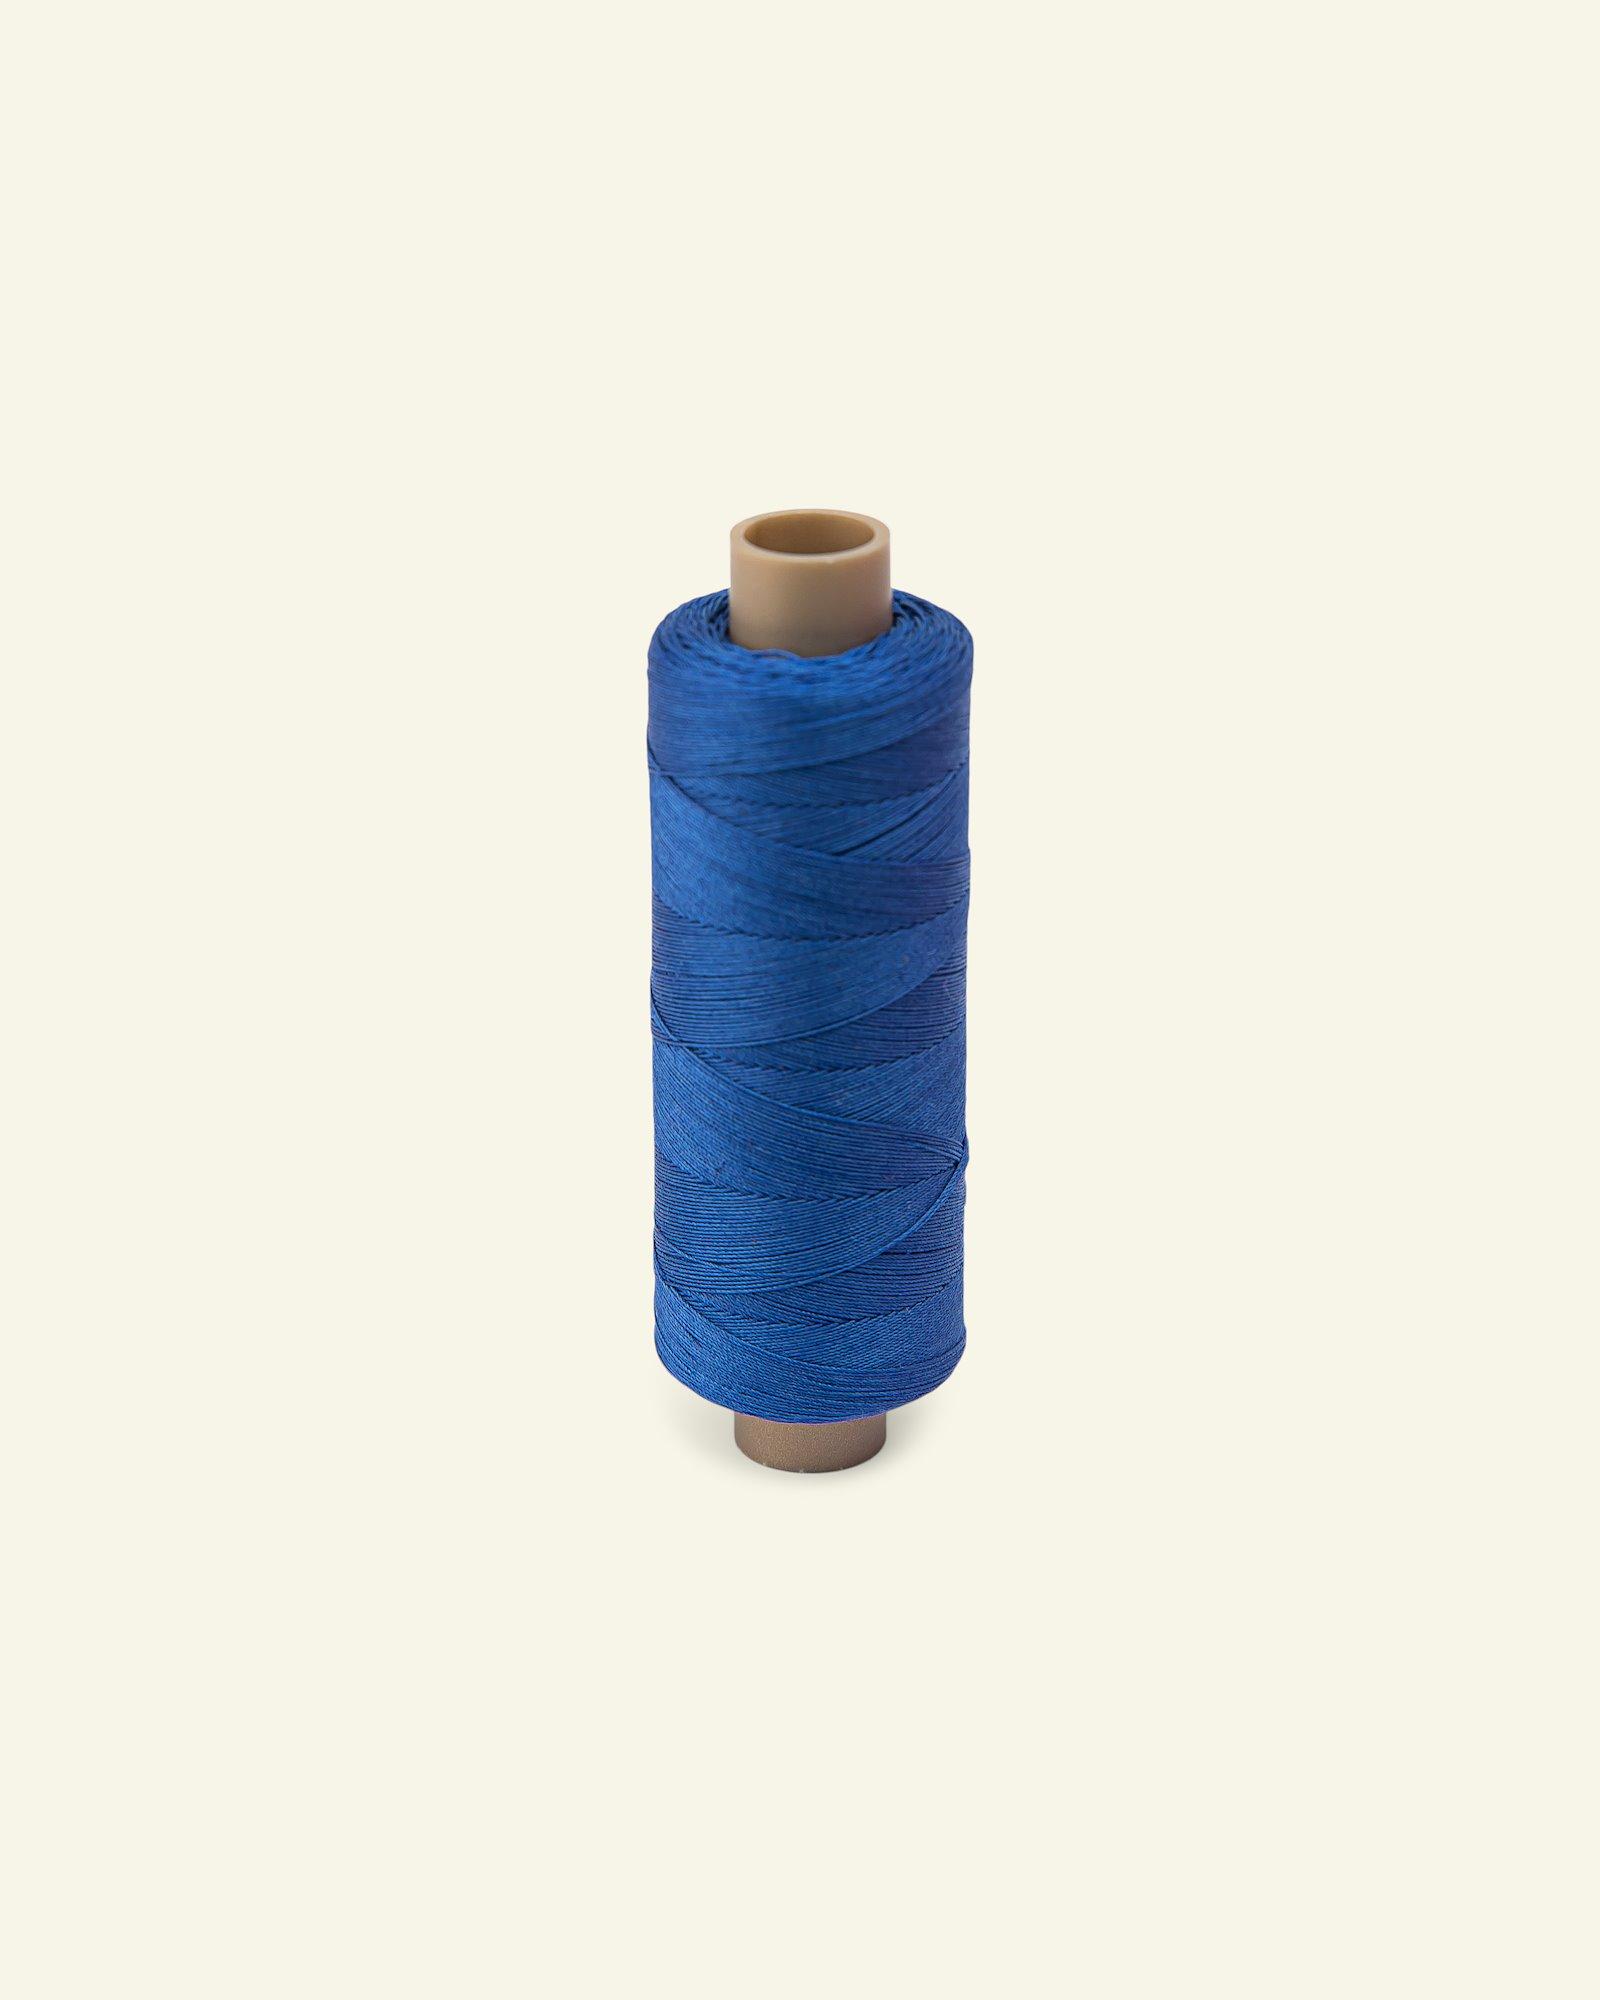 Quilting thread blue 300m